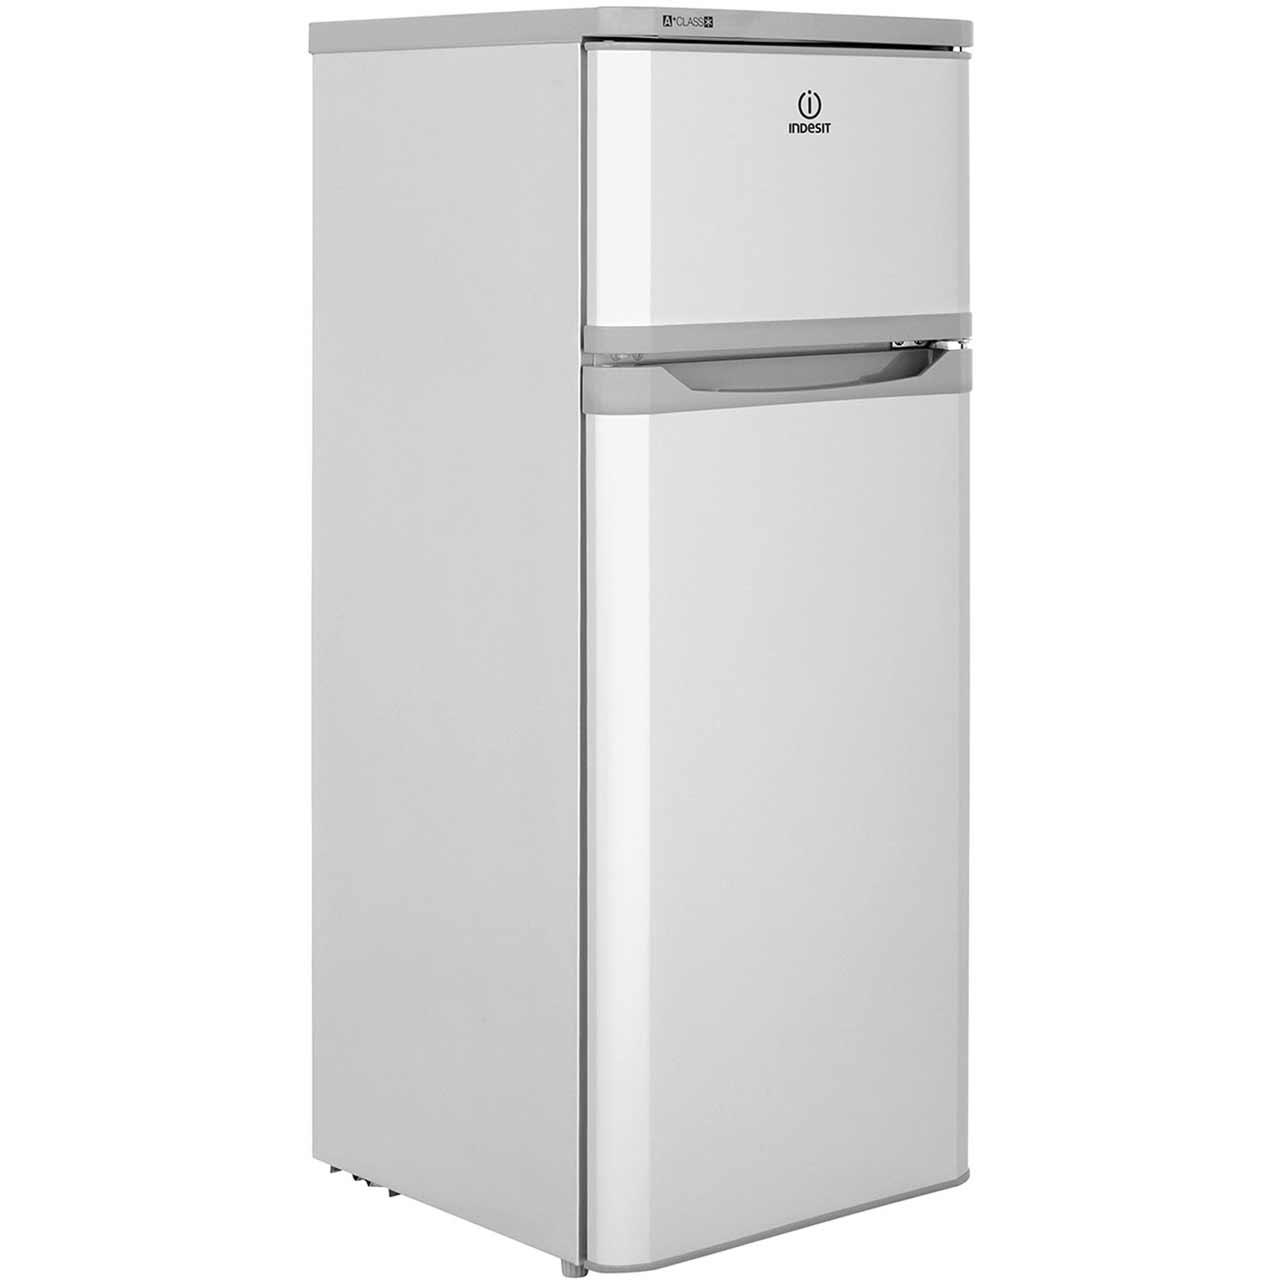 80 20 Split fridge freezer